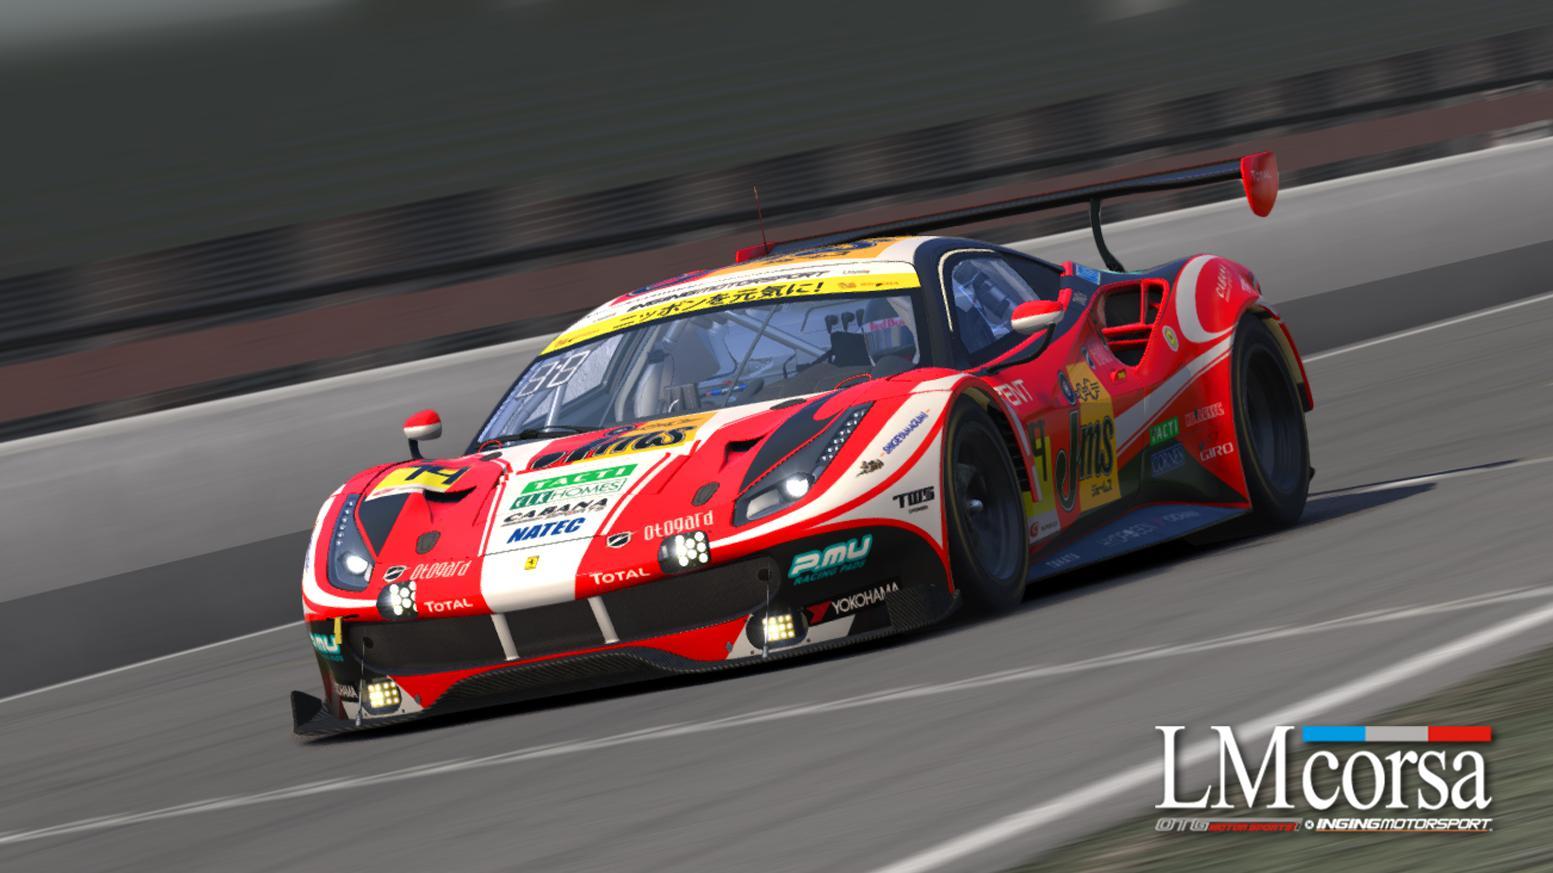 Preview of #51 JMS LM Corsa Ferrari 488 GT3 (Super GT) by Justin S Davis